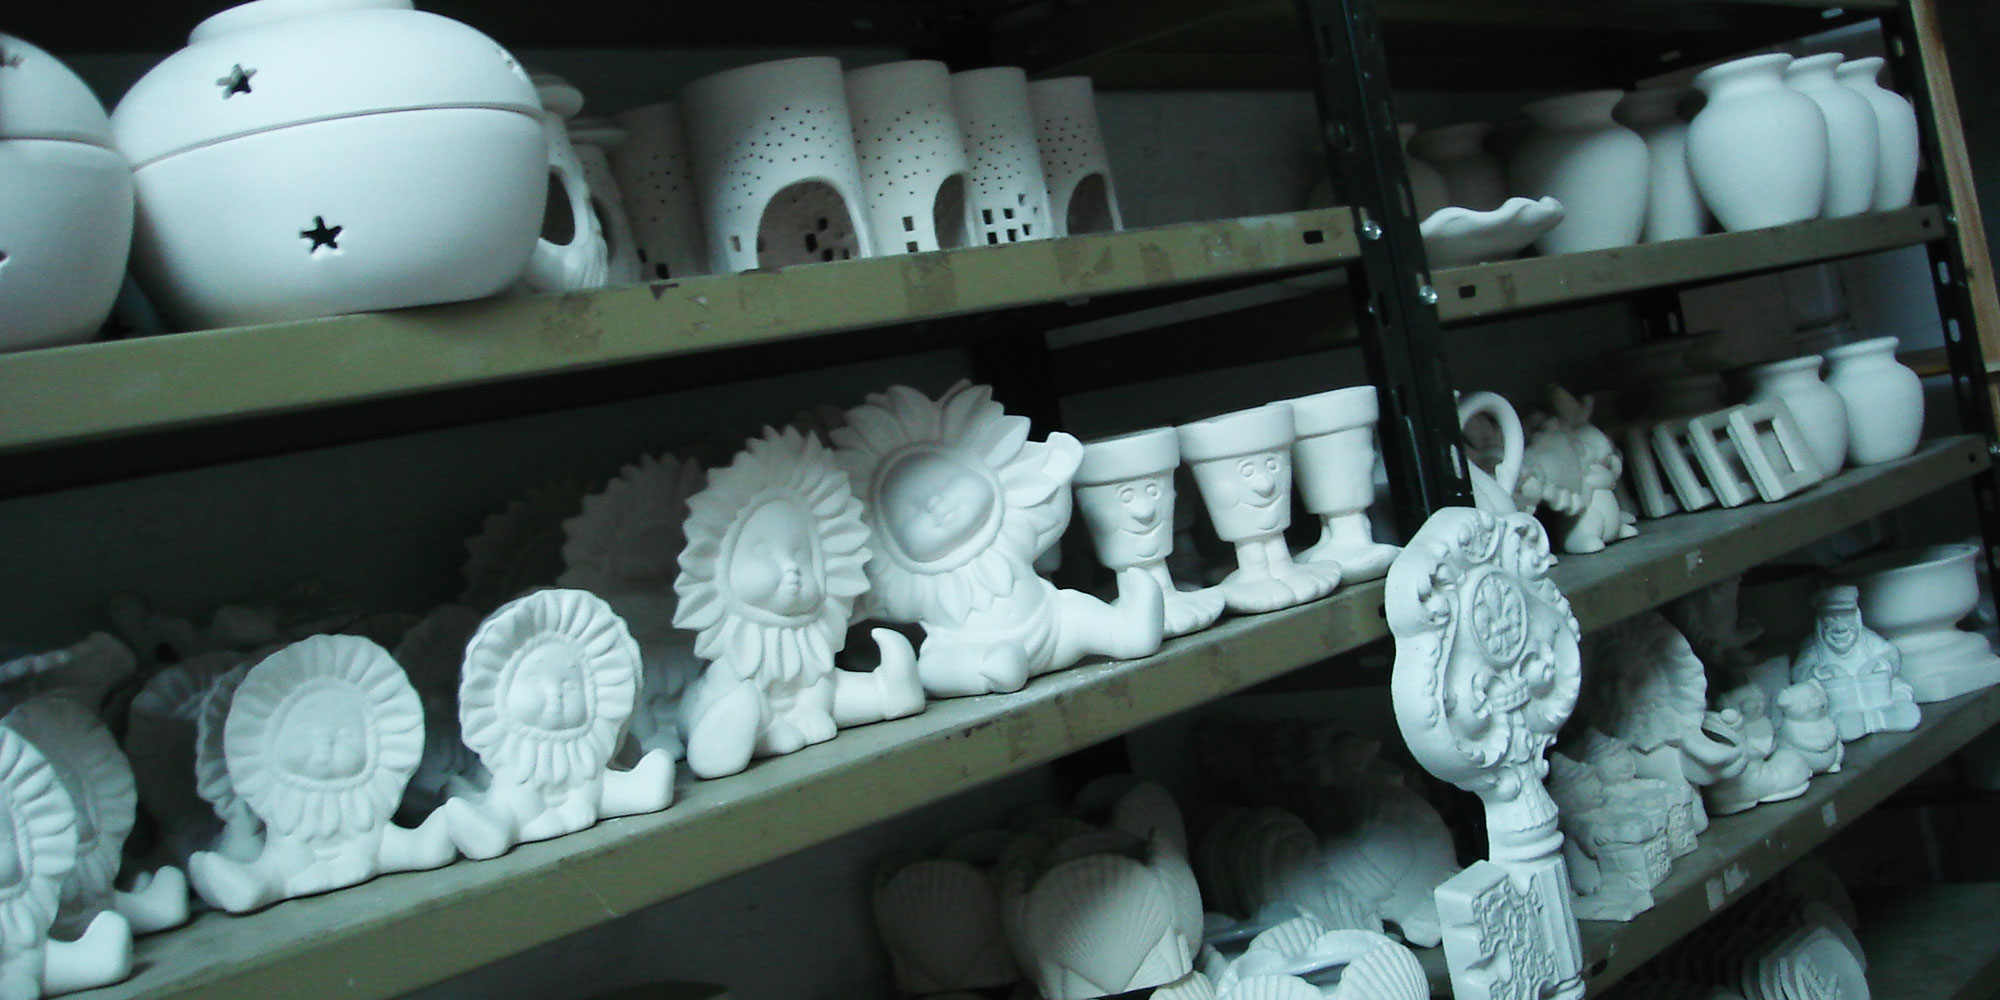 Ceramicalacueva as well 5 Manualidades De Indios Americanos Para Ninos likewise Decoracionesbabyshower together with 63936 further Reciclar Telas. on figuras para decorar